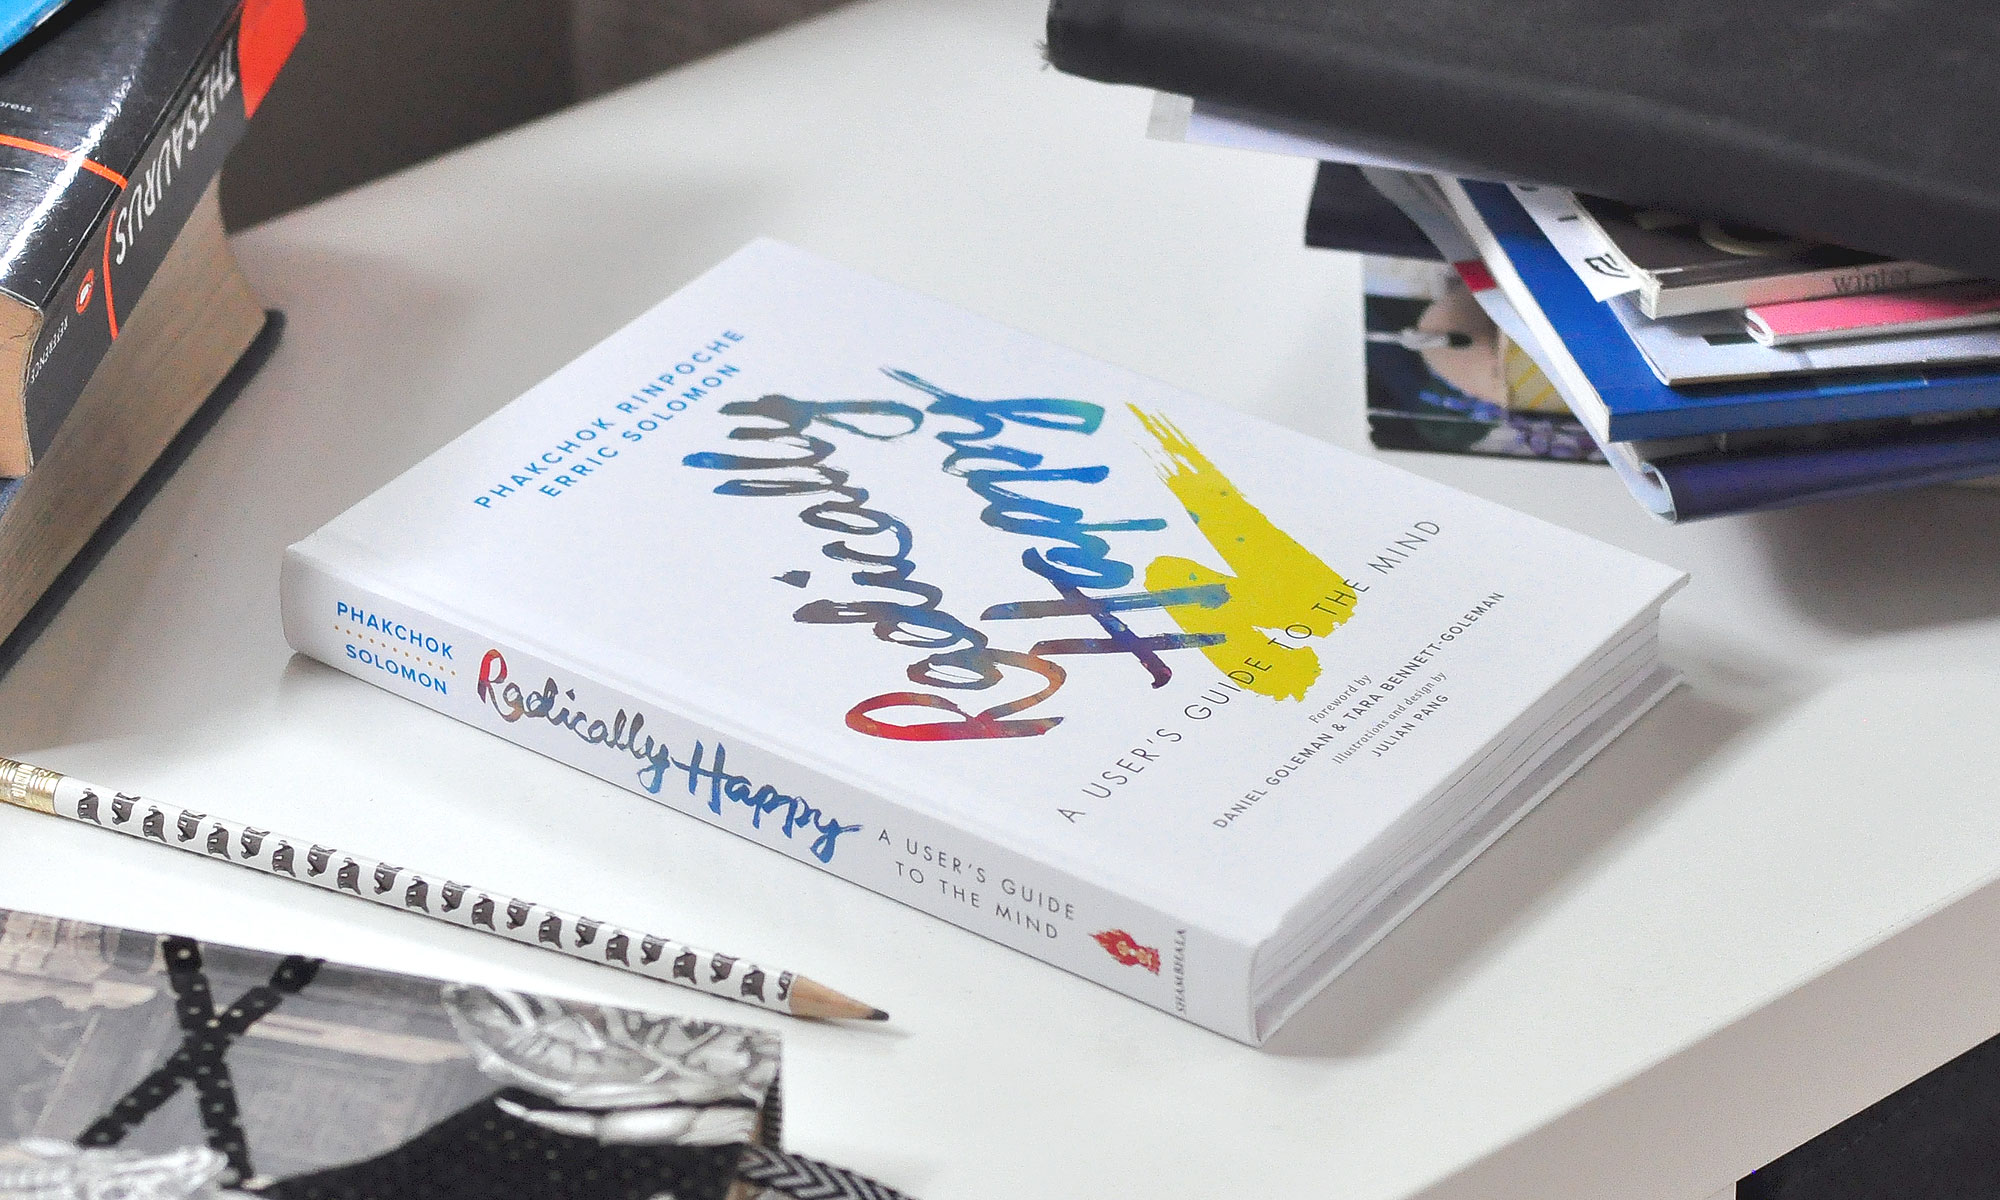 radically-happy-book_DSC_5041a.jpg